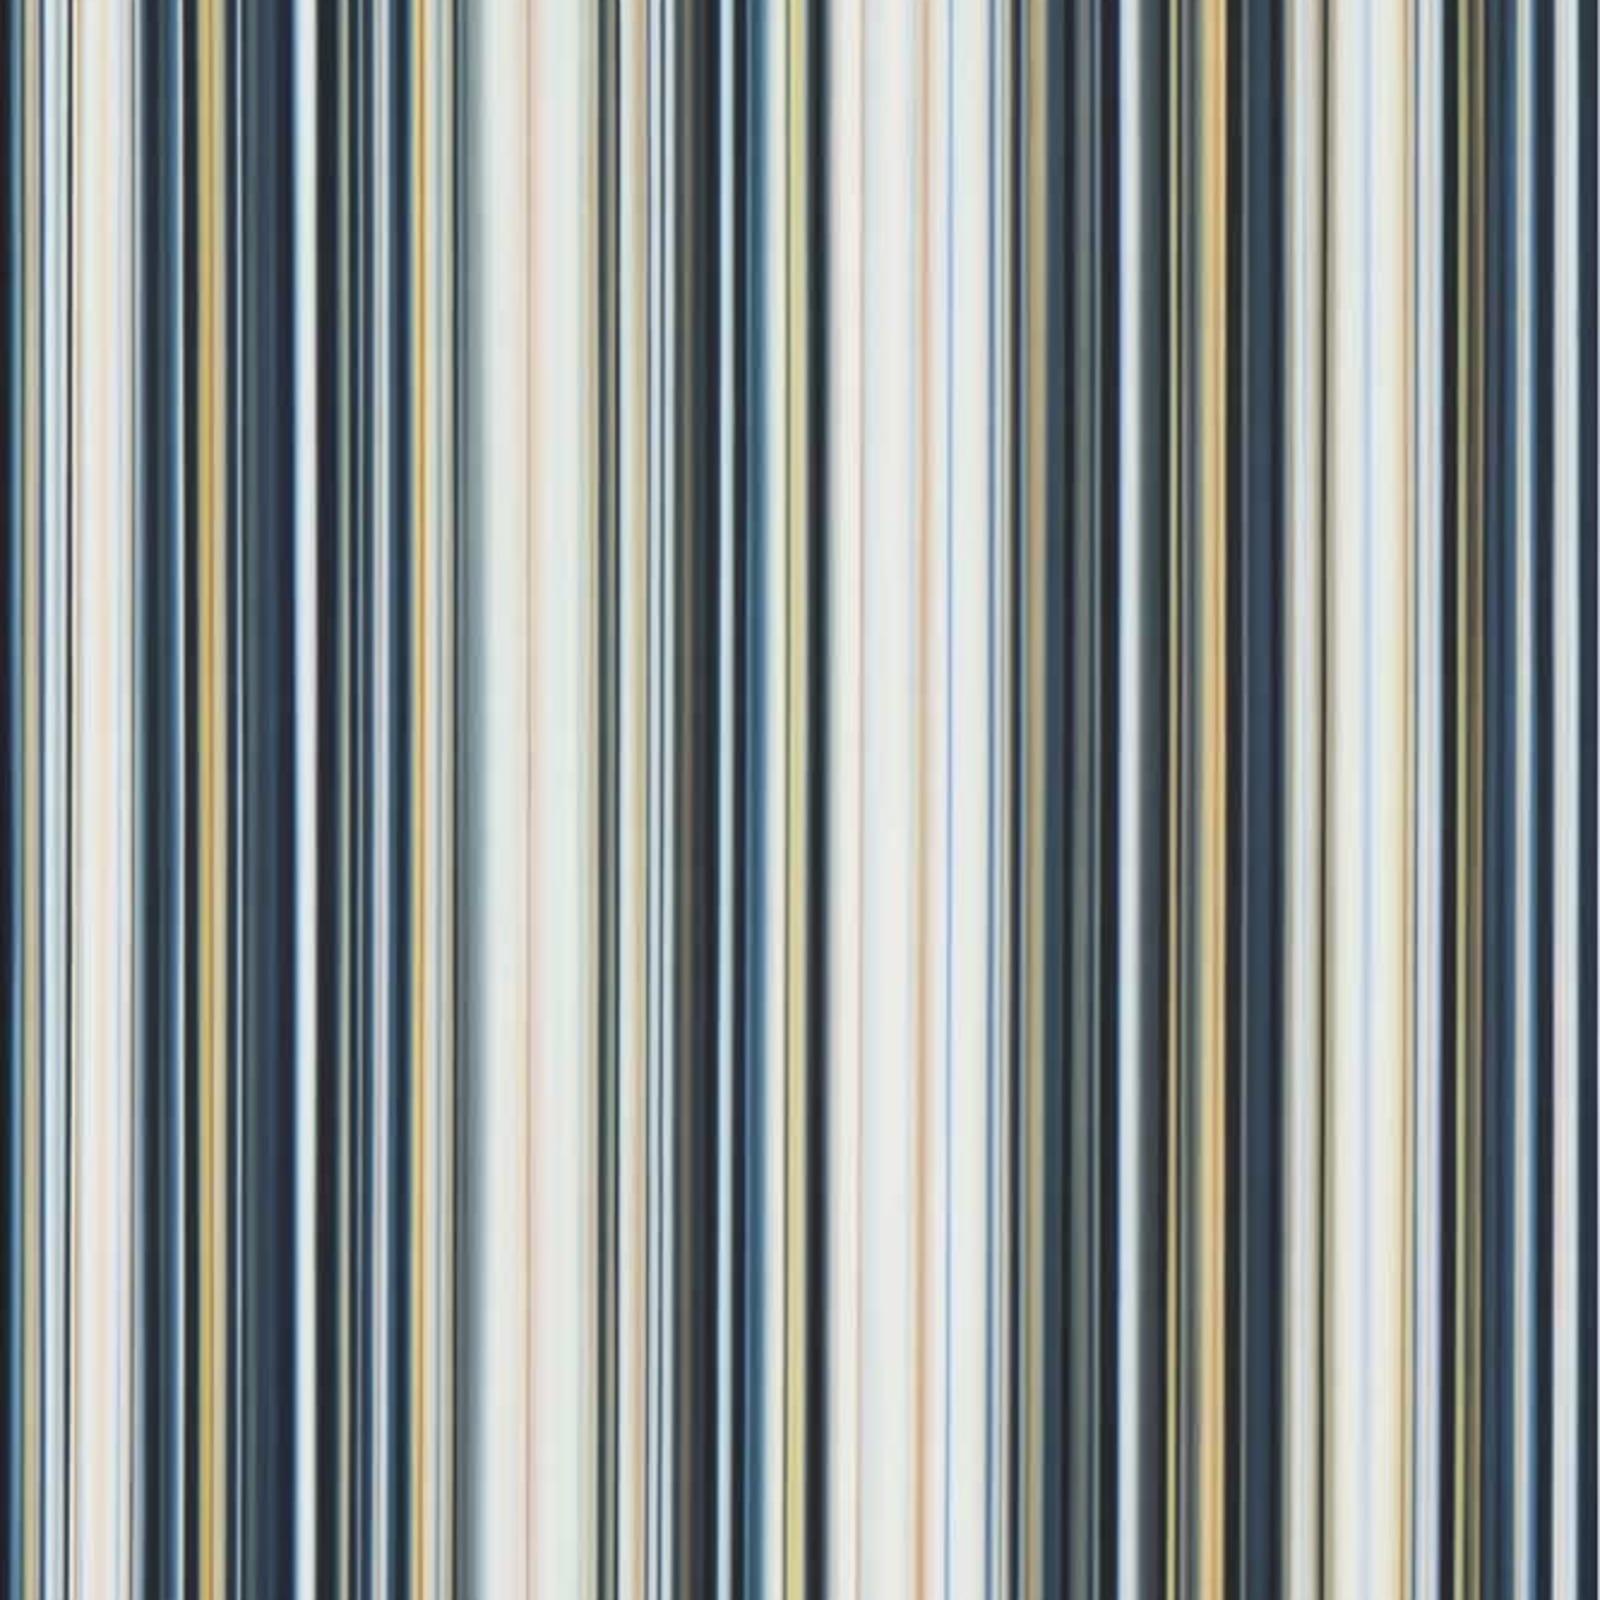 Cornelia Thomsen - Stripes Nr. 88, 2015, Oil on canvas, 48 x 32 inches